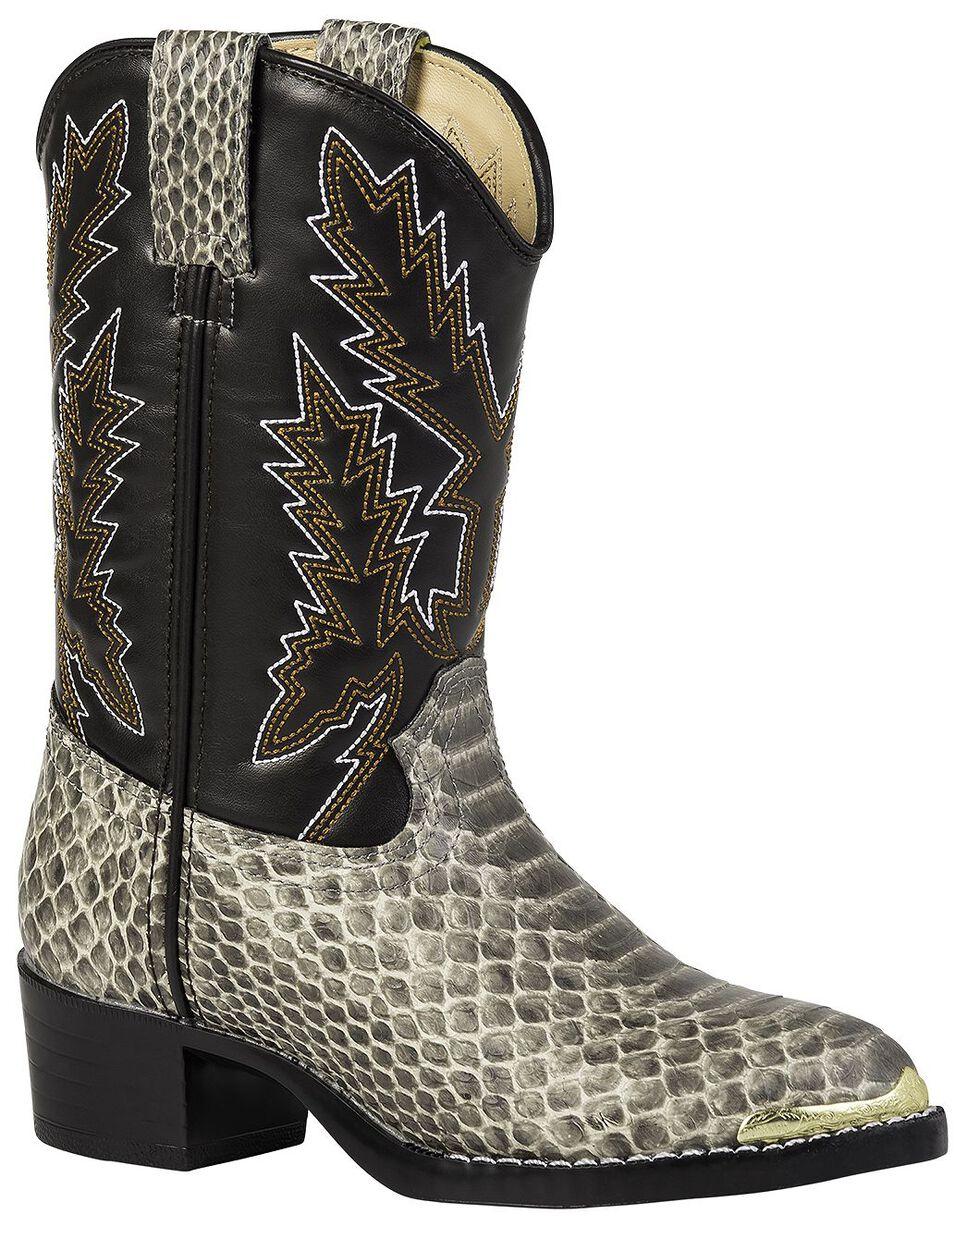 Durango Youth Girls' Snake Print Cowboy Boots, Snake Print, hi-res